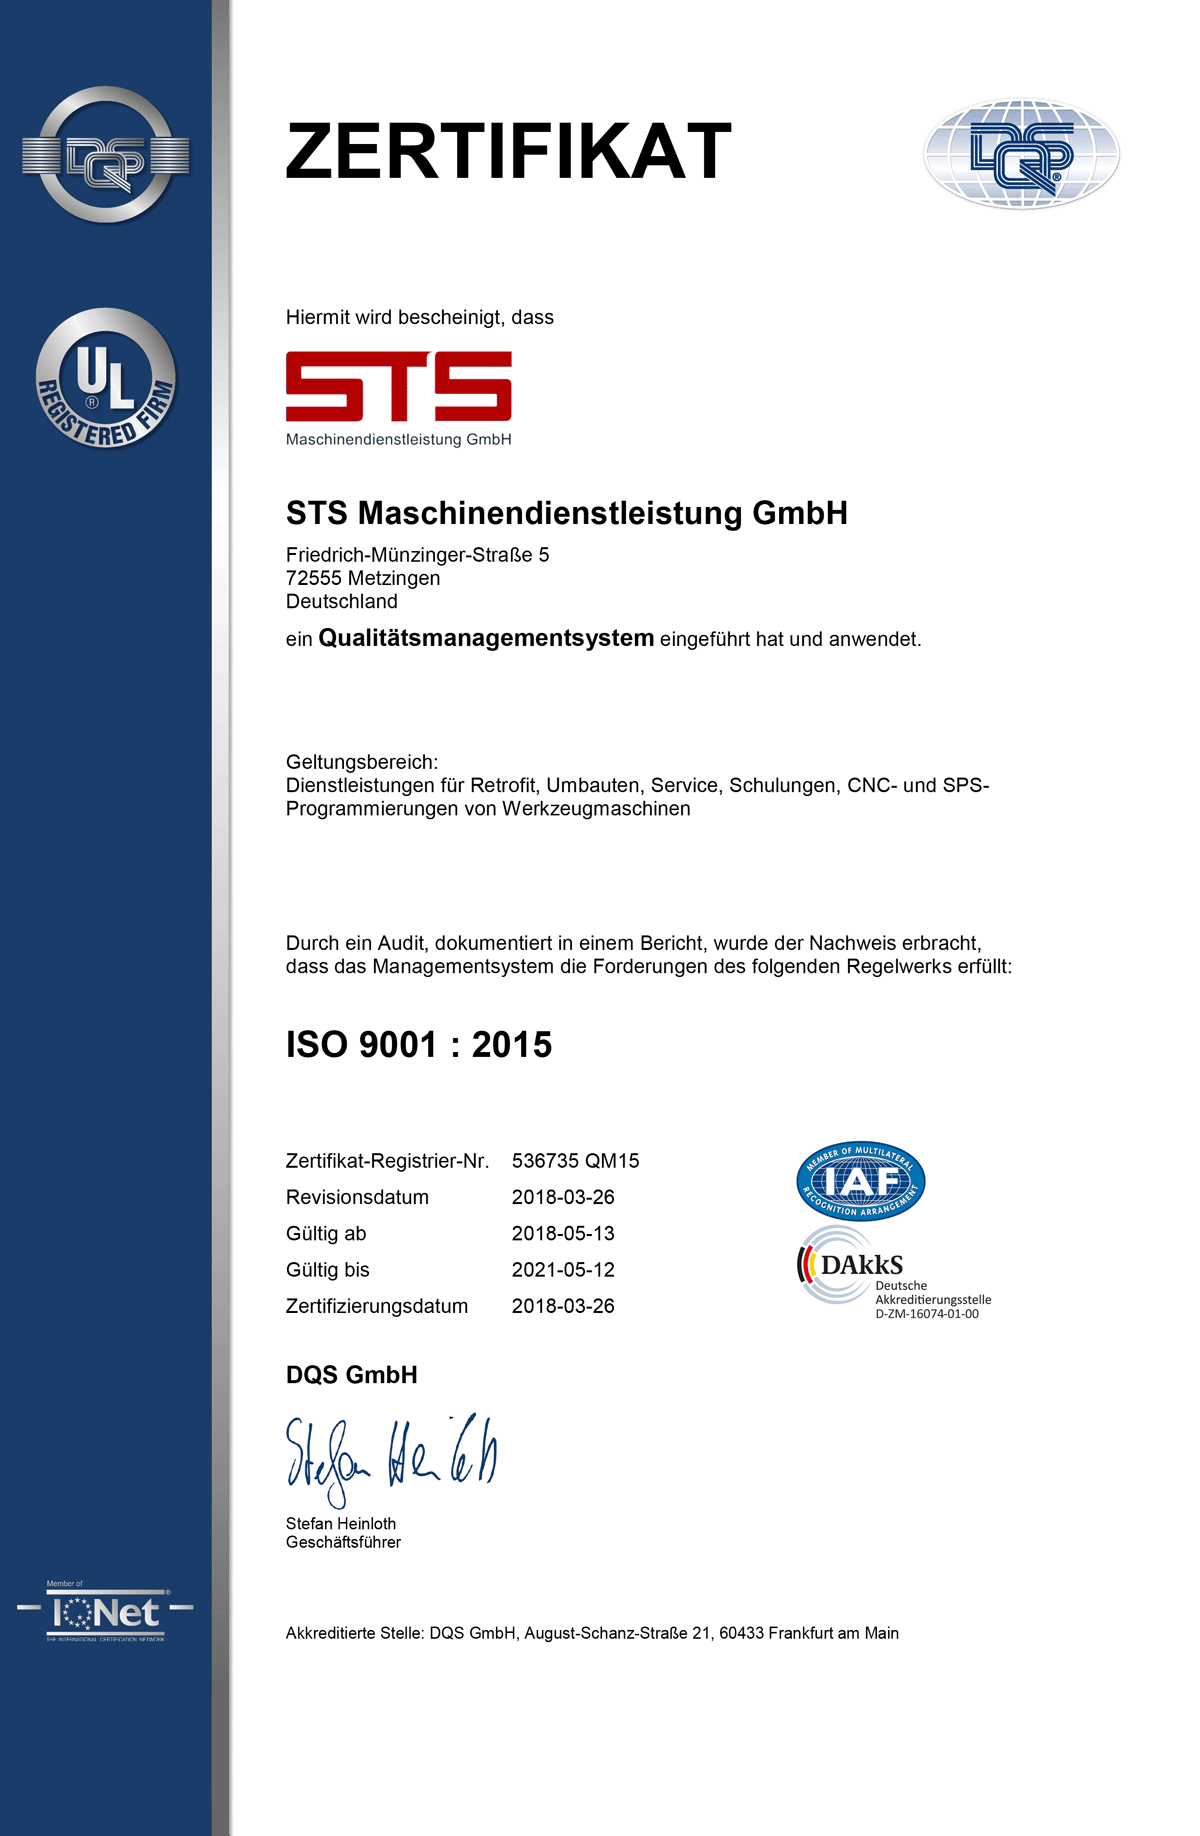 Zertifikat Qualität management system STS